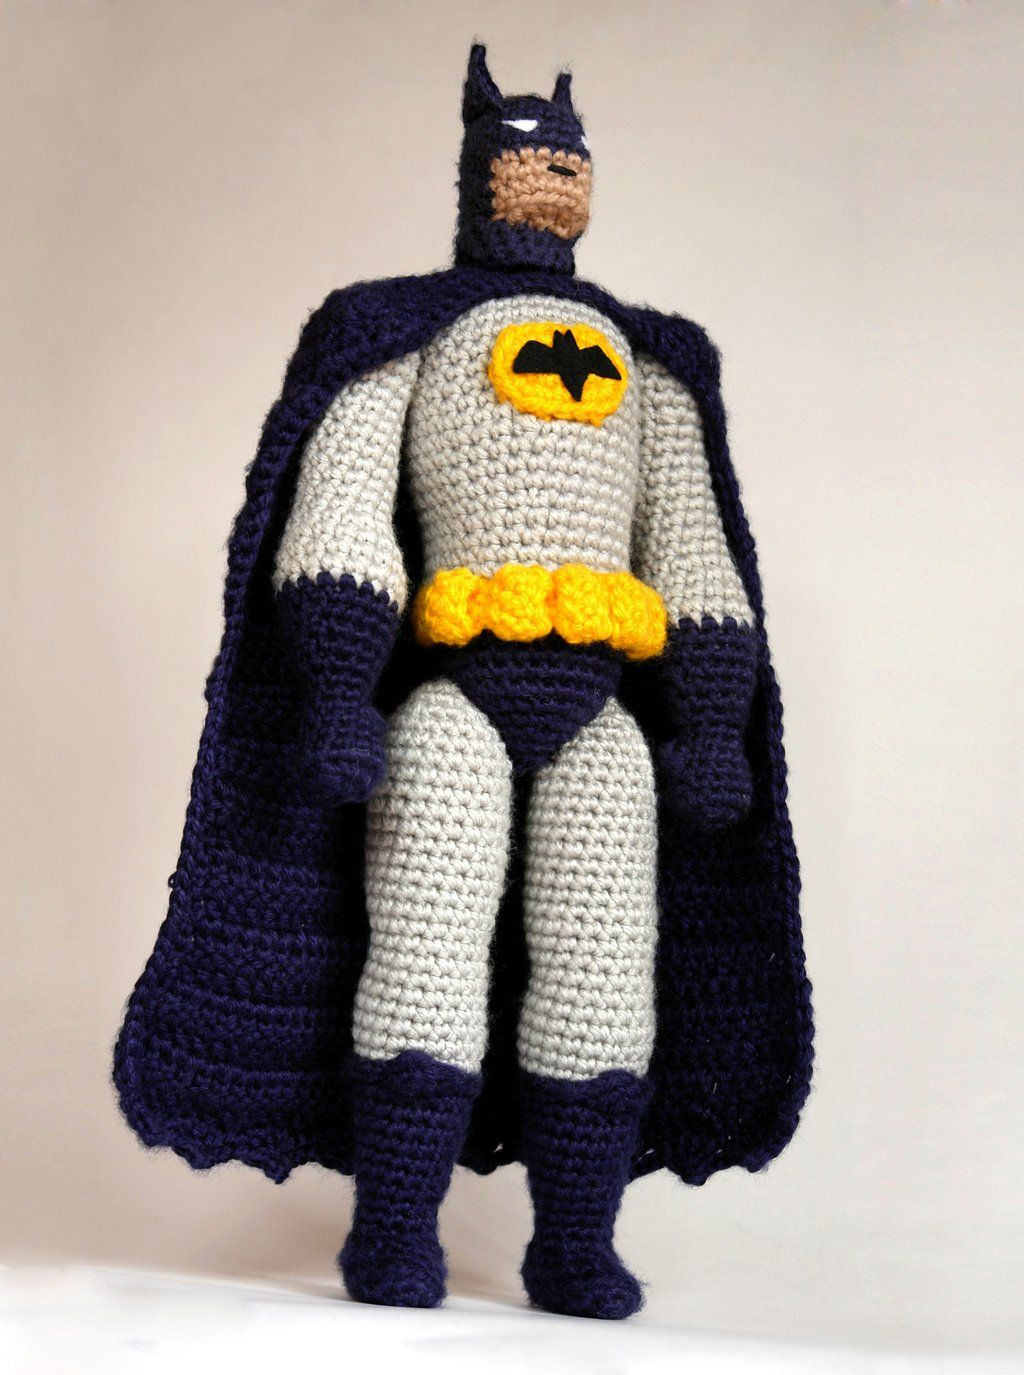 Batman crochet amigurumi doll by tinyAlchemy on DeviantArt ...